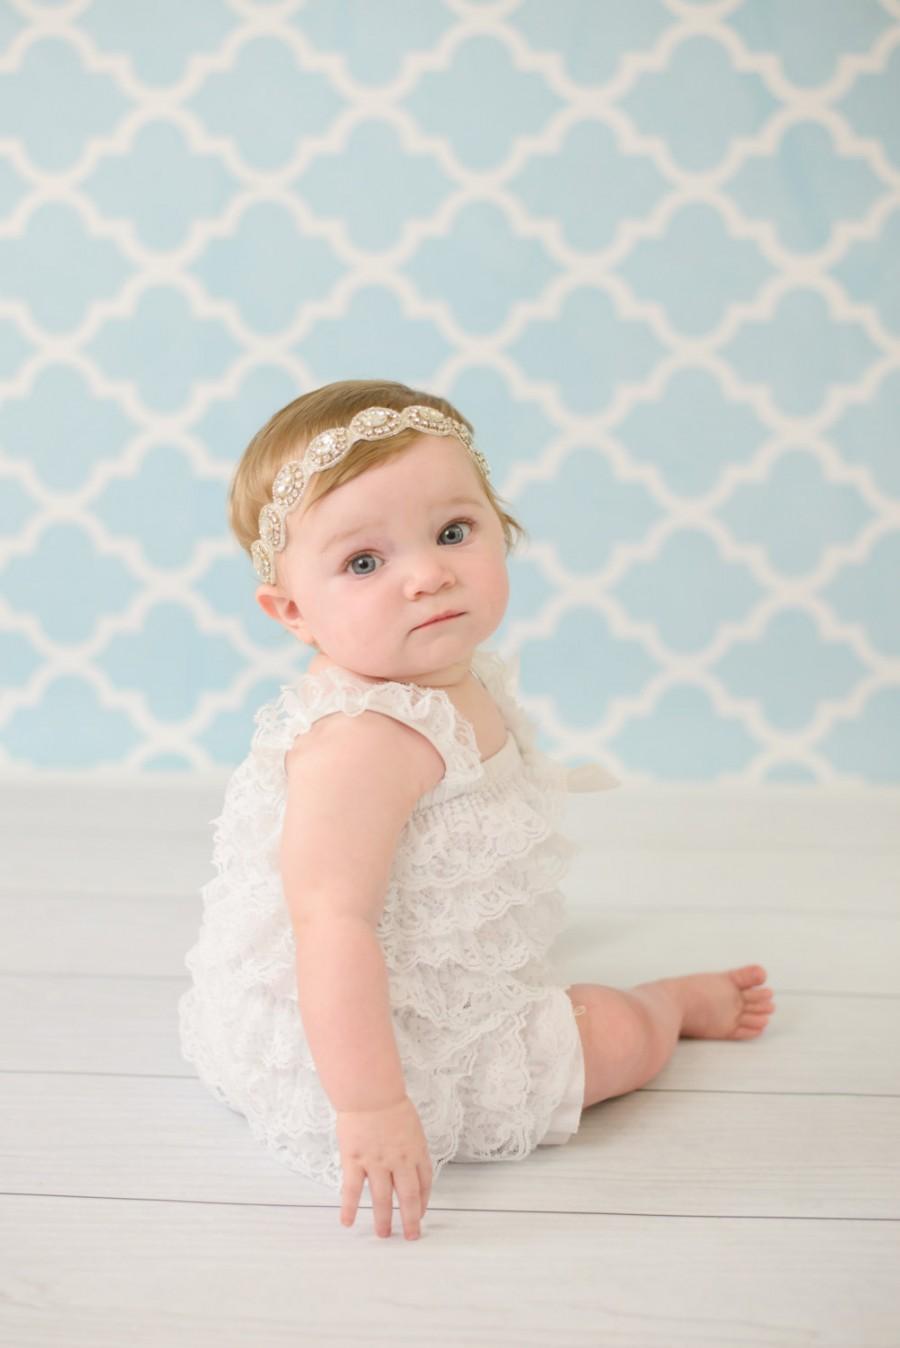 Wedding - Flower Girl Headband, Baby Rhinestone Headband, Newborn Headband, Crystal Headband, Bling Headband, Wedding Headband